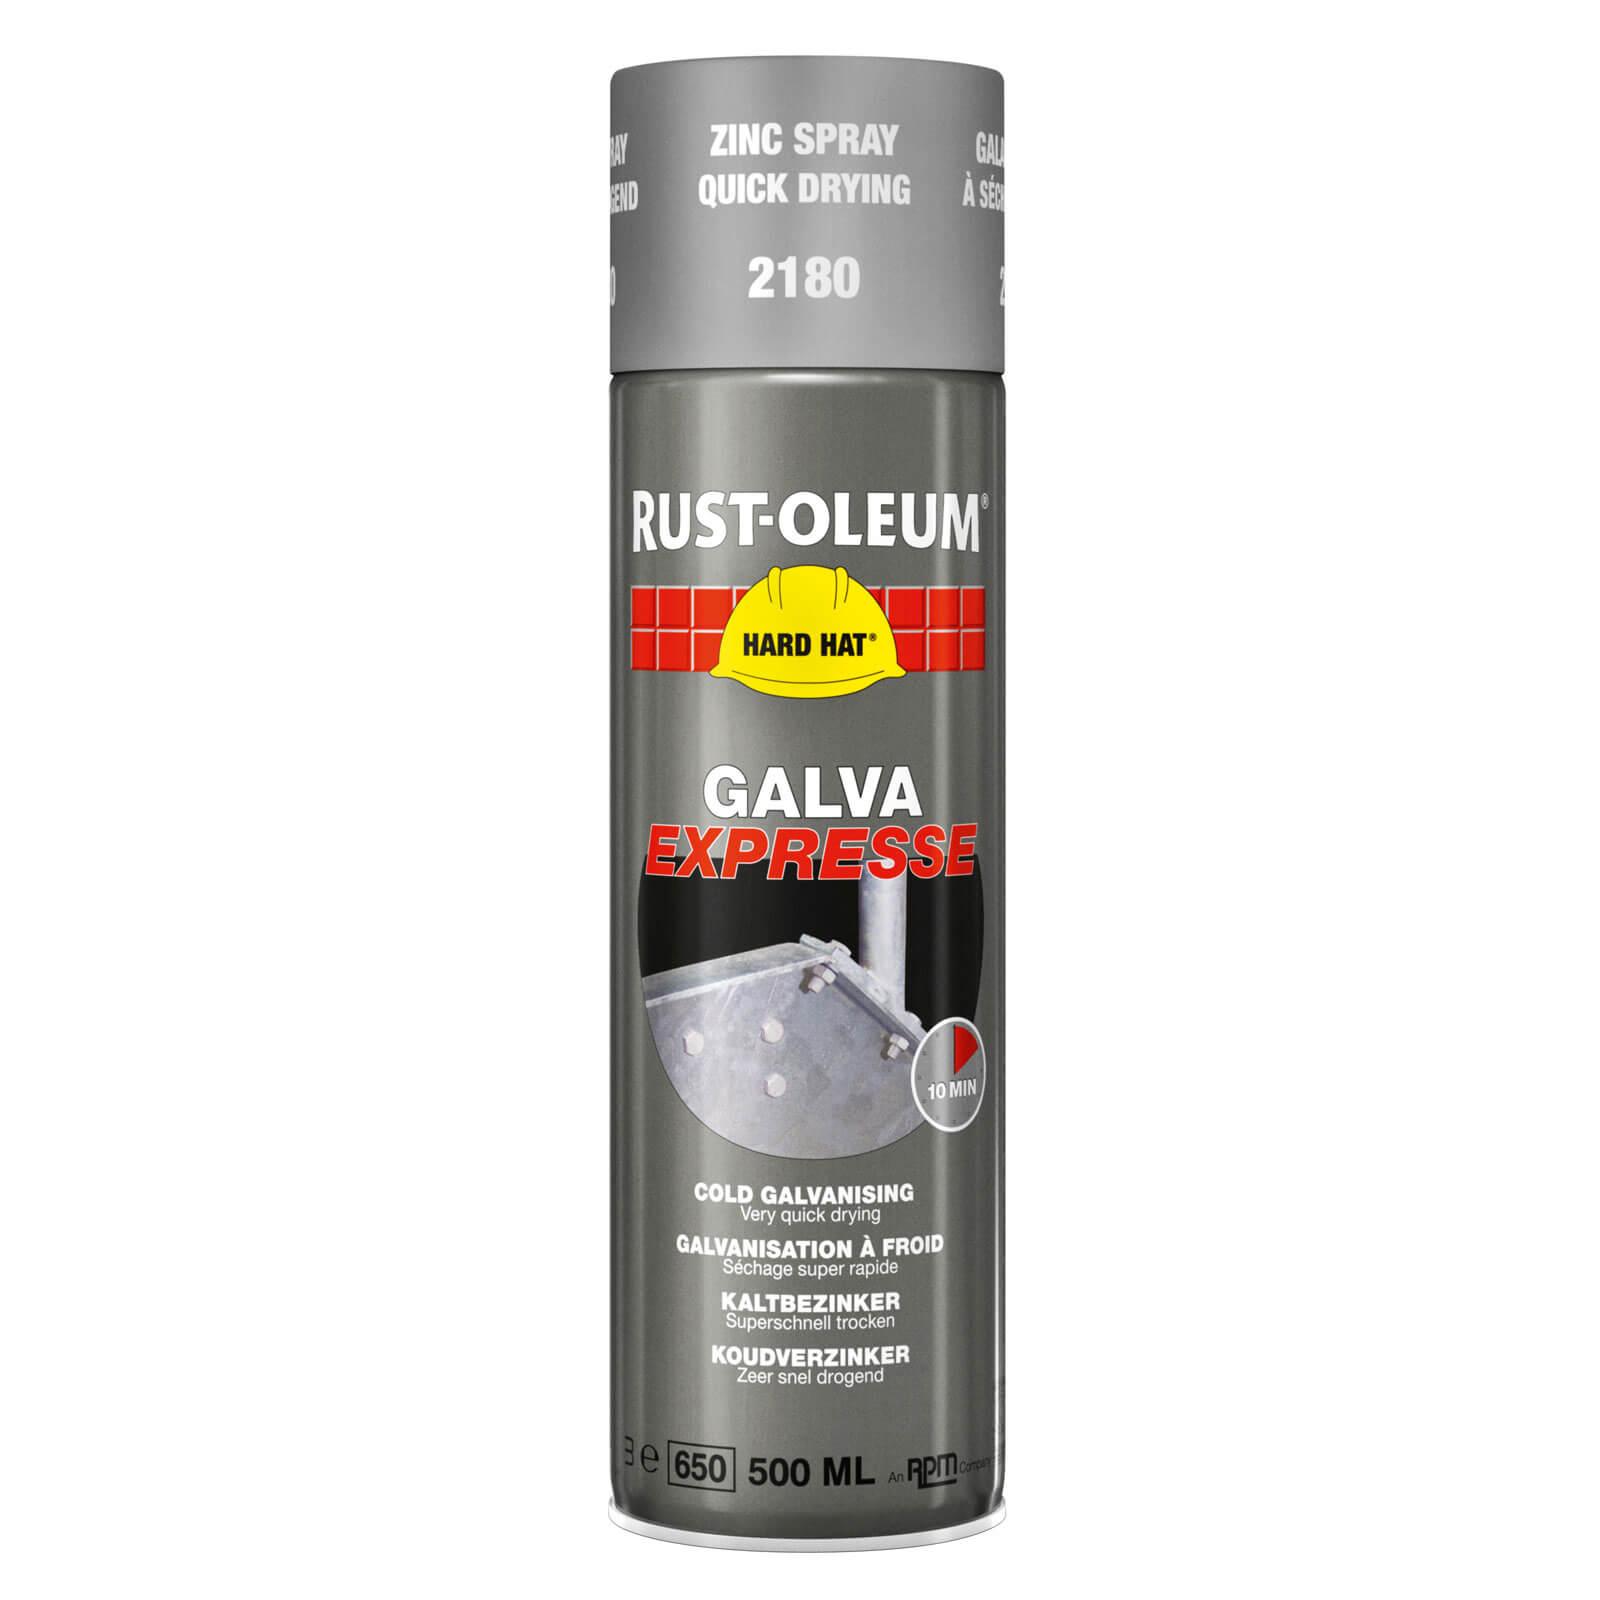 Image of Rust Oleum Hard Hat Galva Express Metal Spray Galvanizing Zinc 500ml